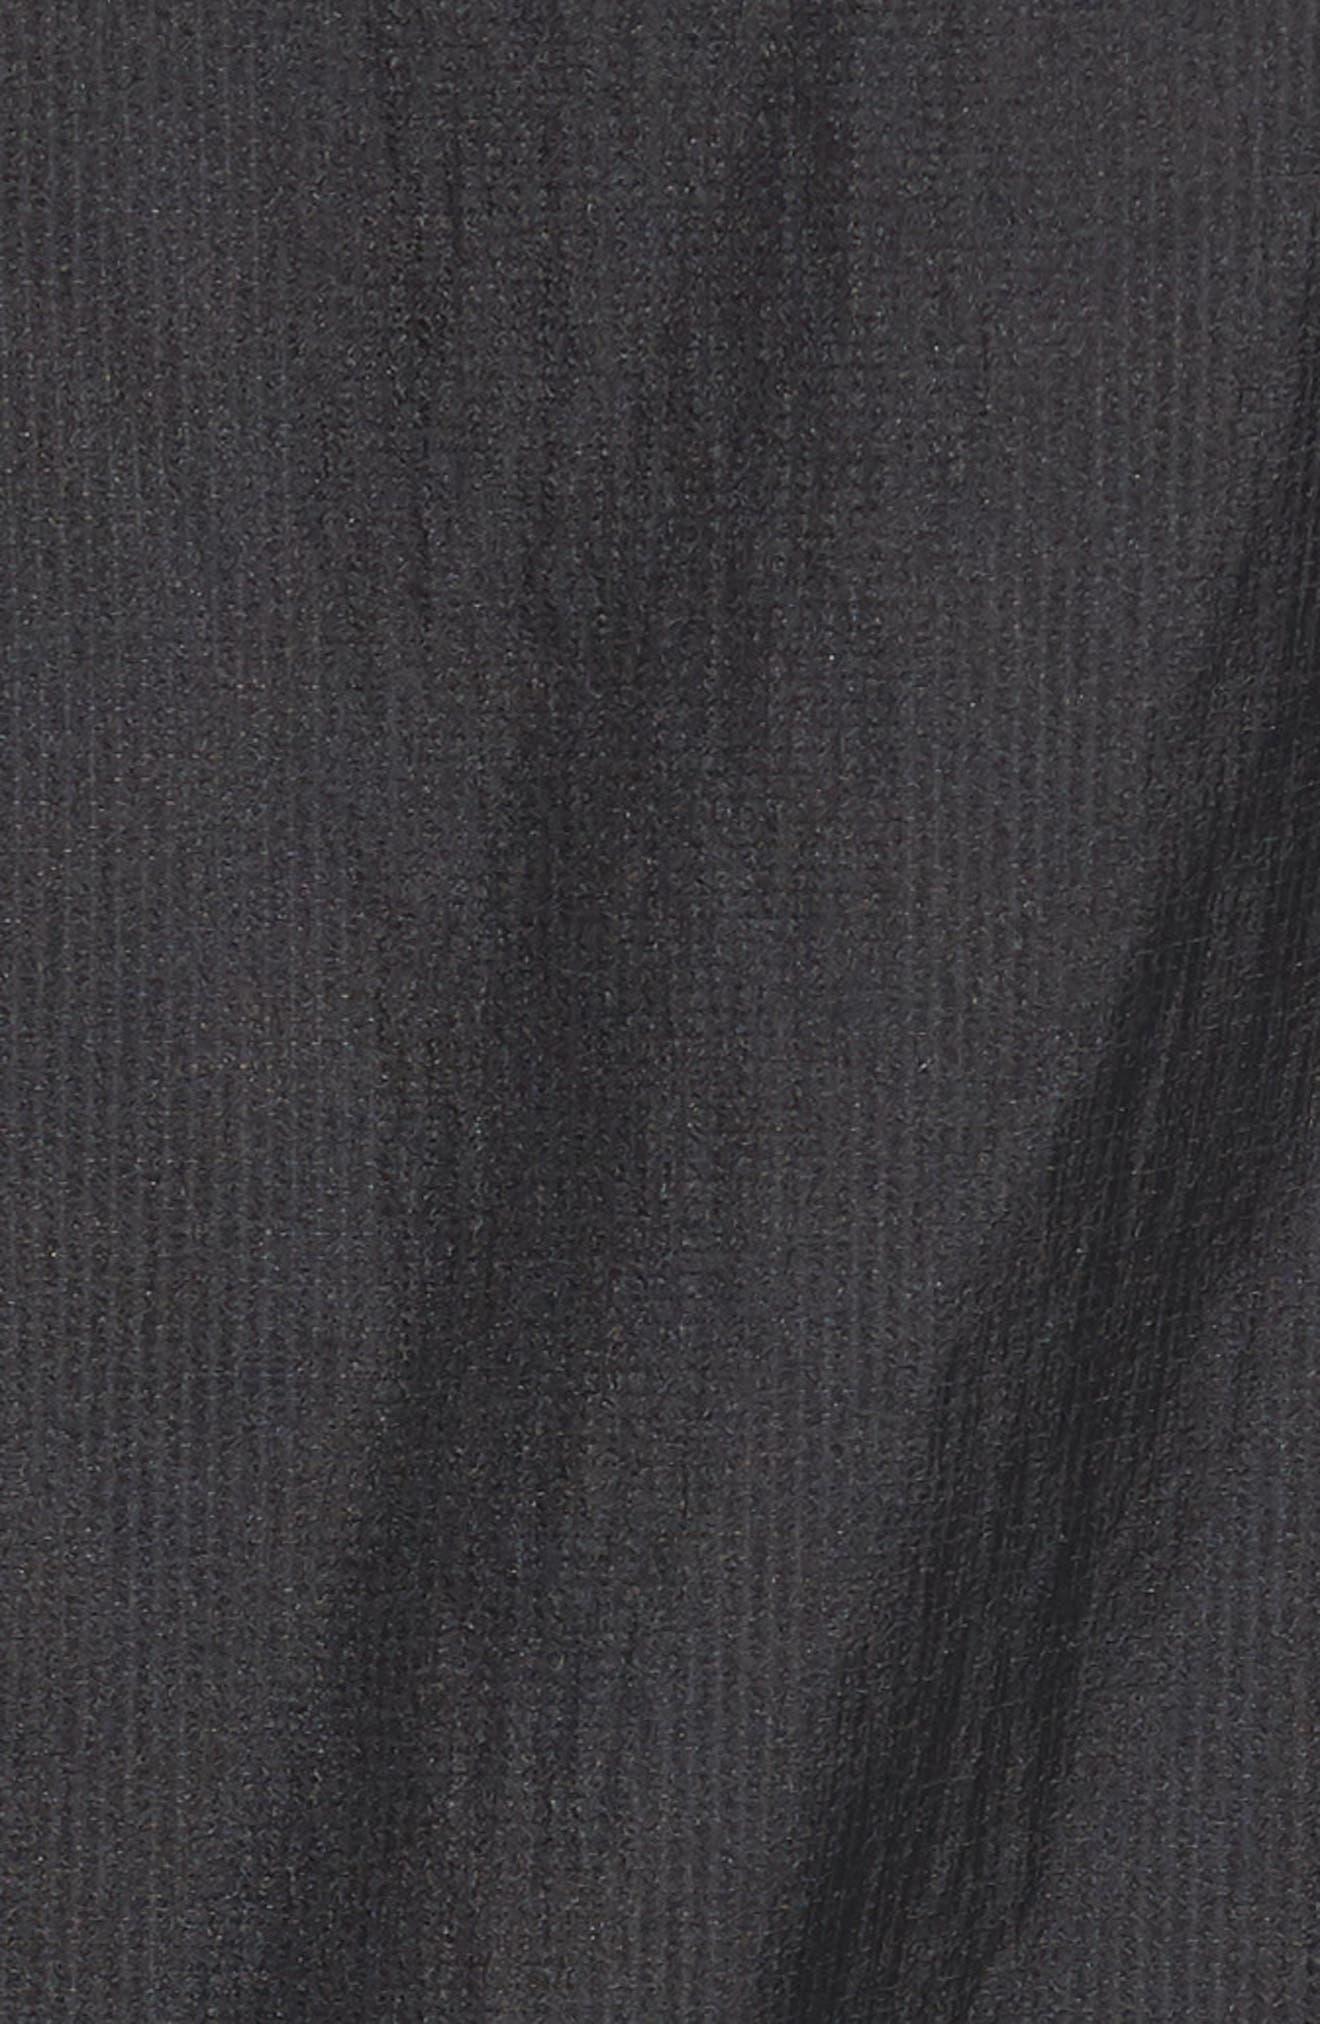 Souvenir Jacket,                             Alternate thumbnail 5, color,                             Black